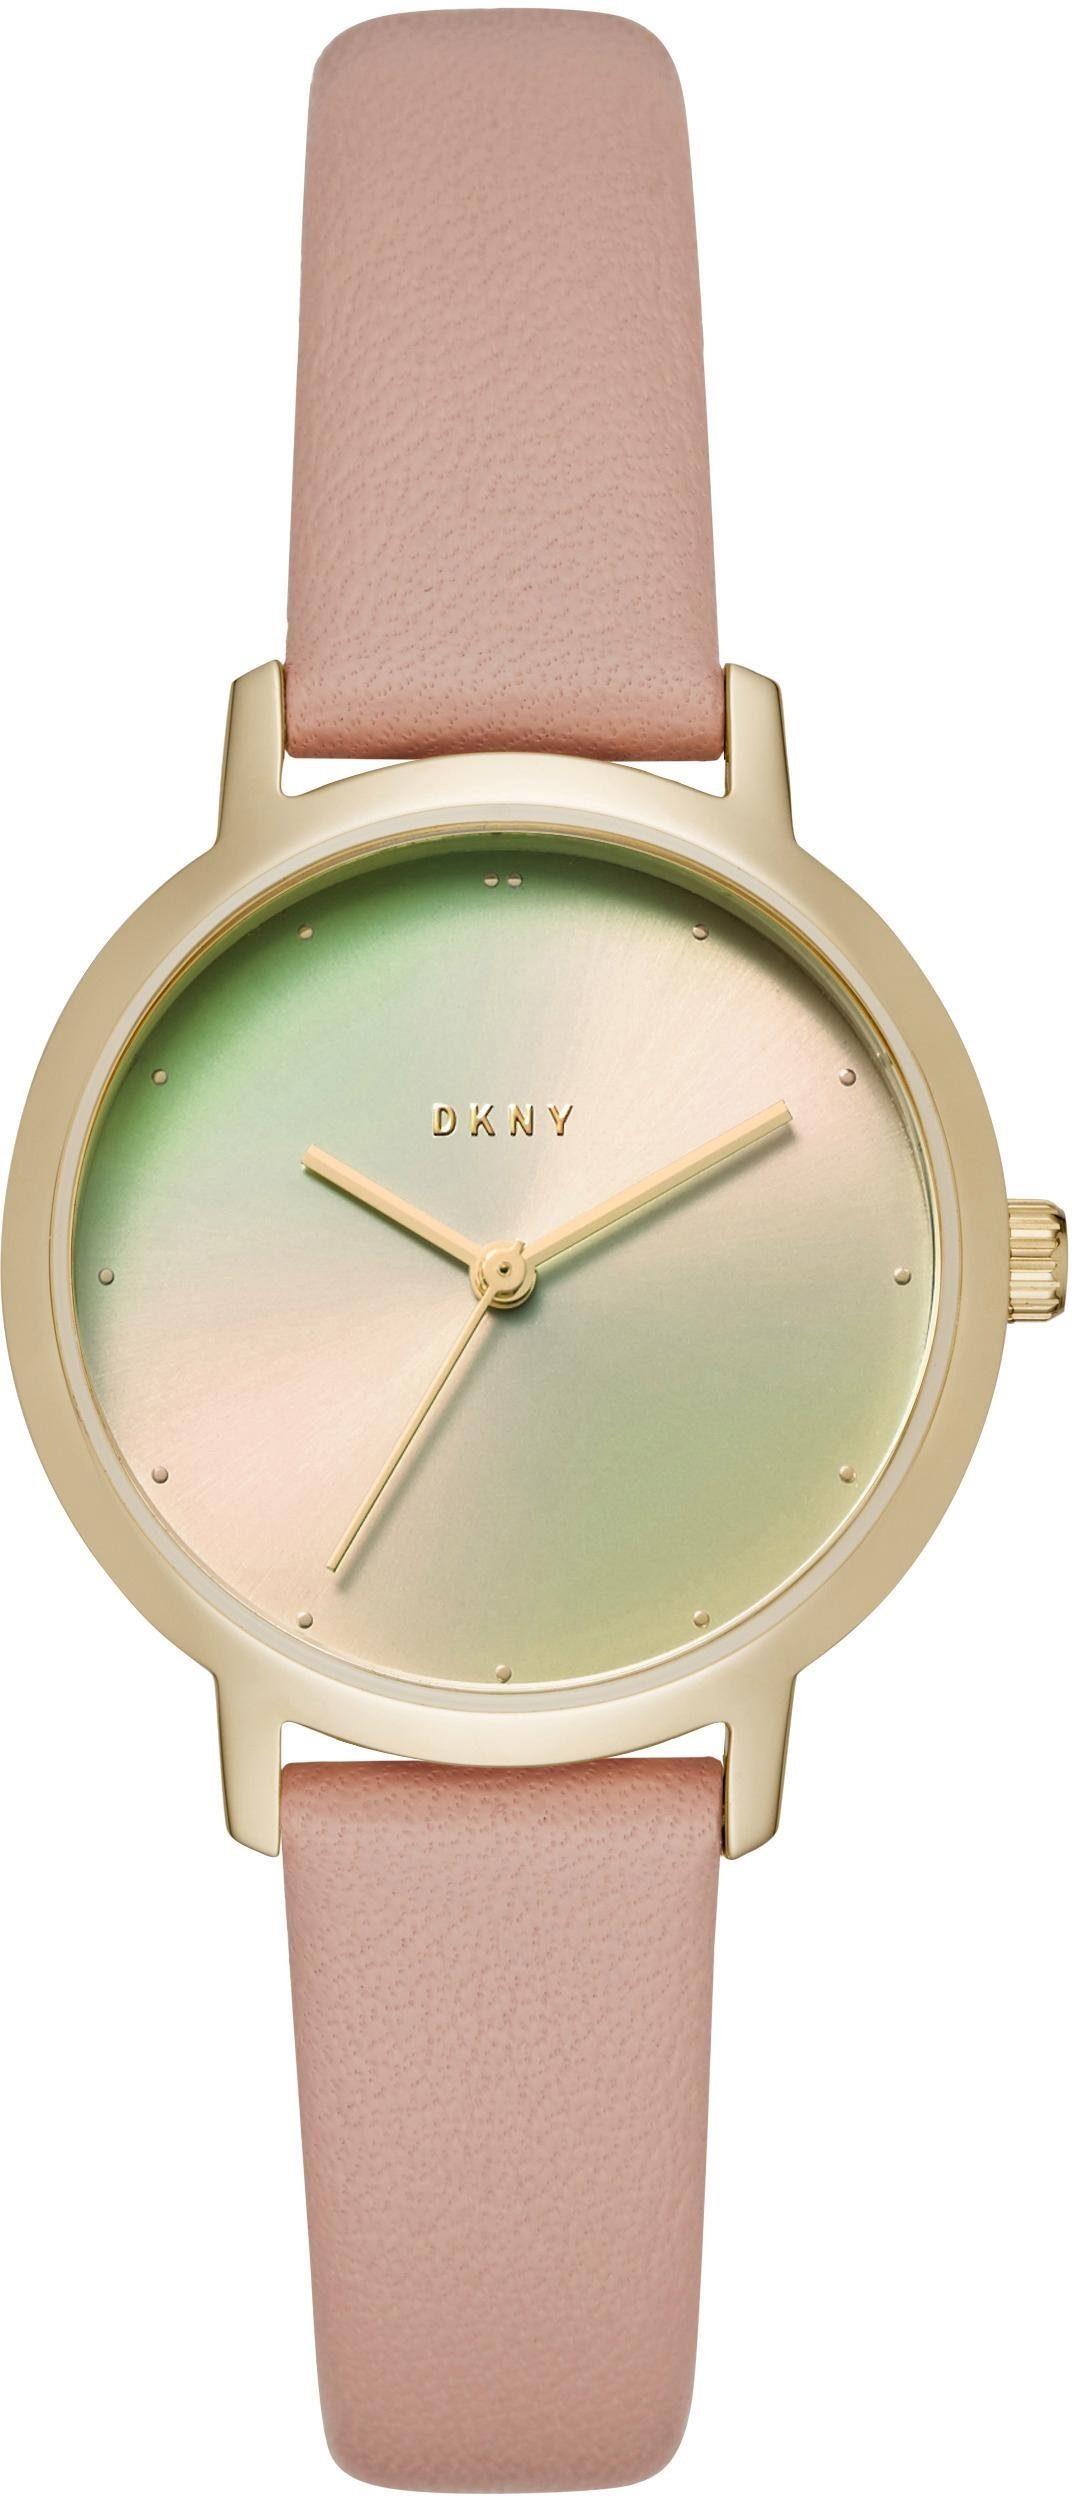 DKNY Quarzuhr »THE MODERNIST, NY2739« mit irisierendem Mineralglas